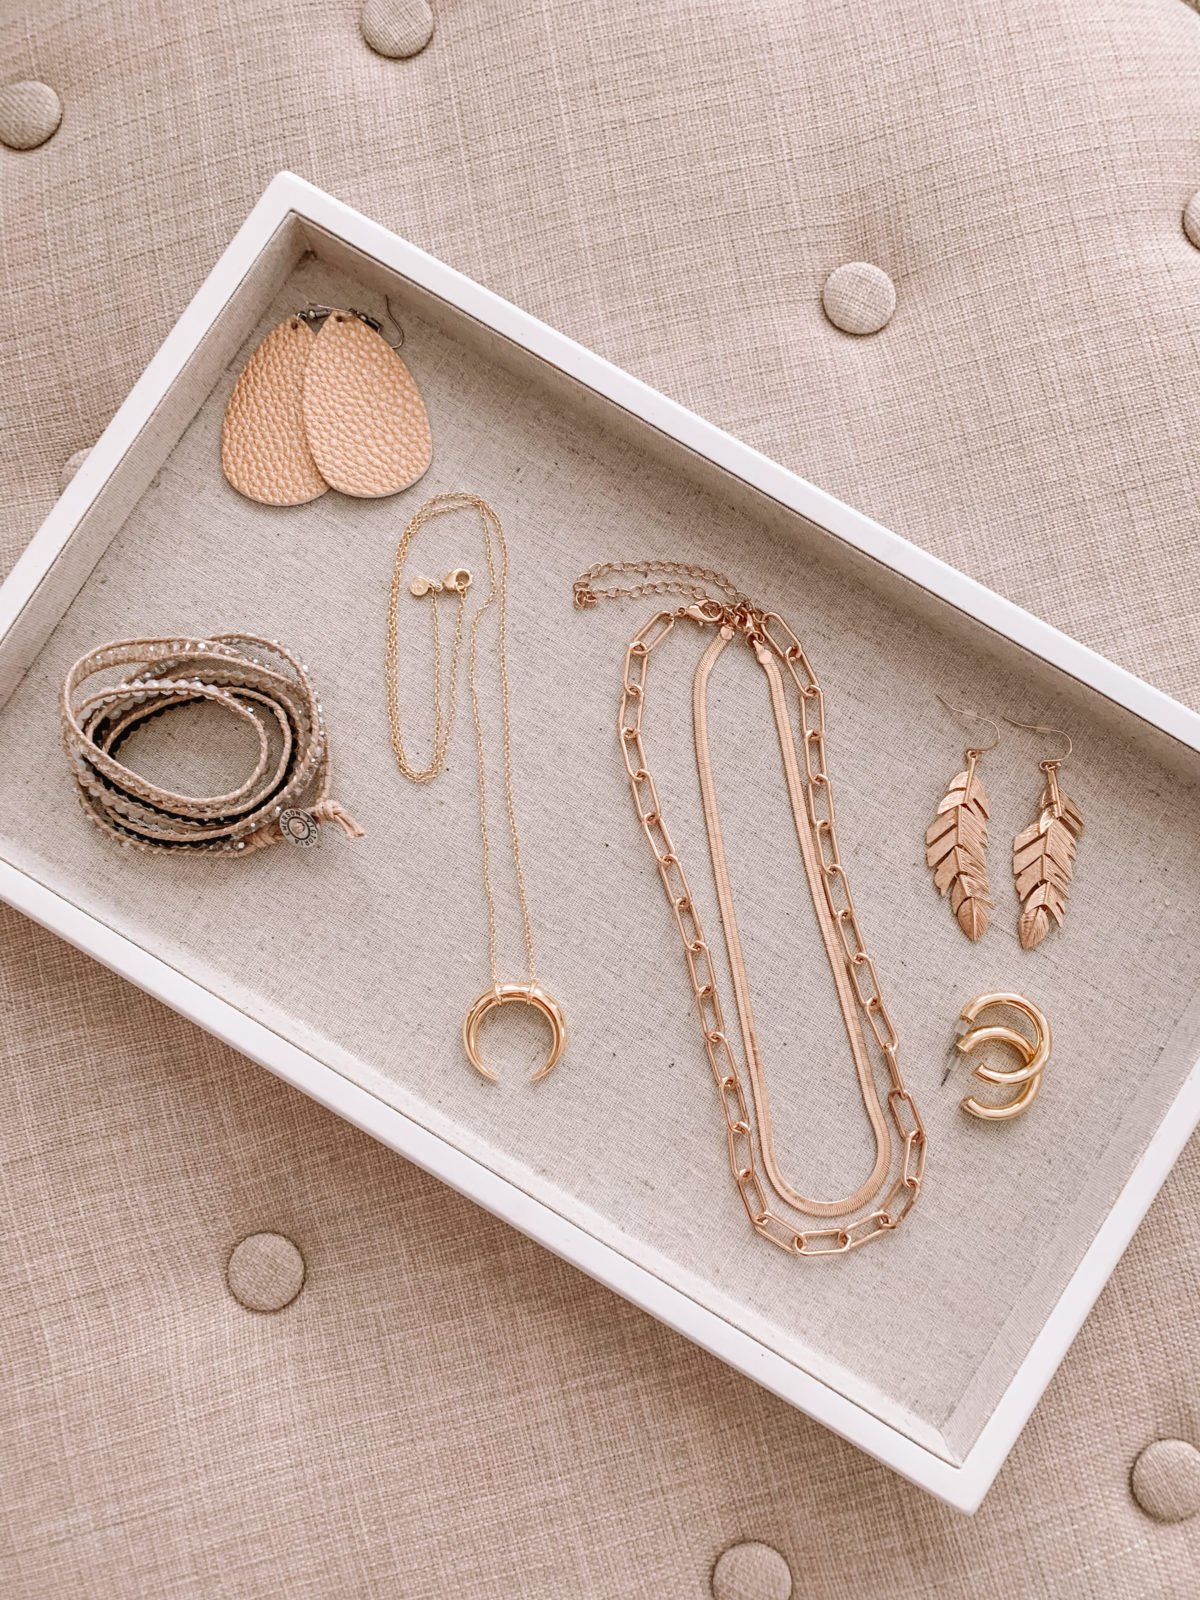 Amazon Fashion Faves, Wrap Bracelet, Faux Leather Earrings, Half Moon necklace, Double Necklace, Feather Earrings, hoop earrings